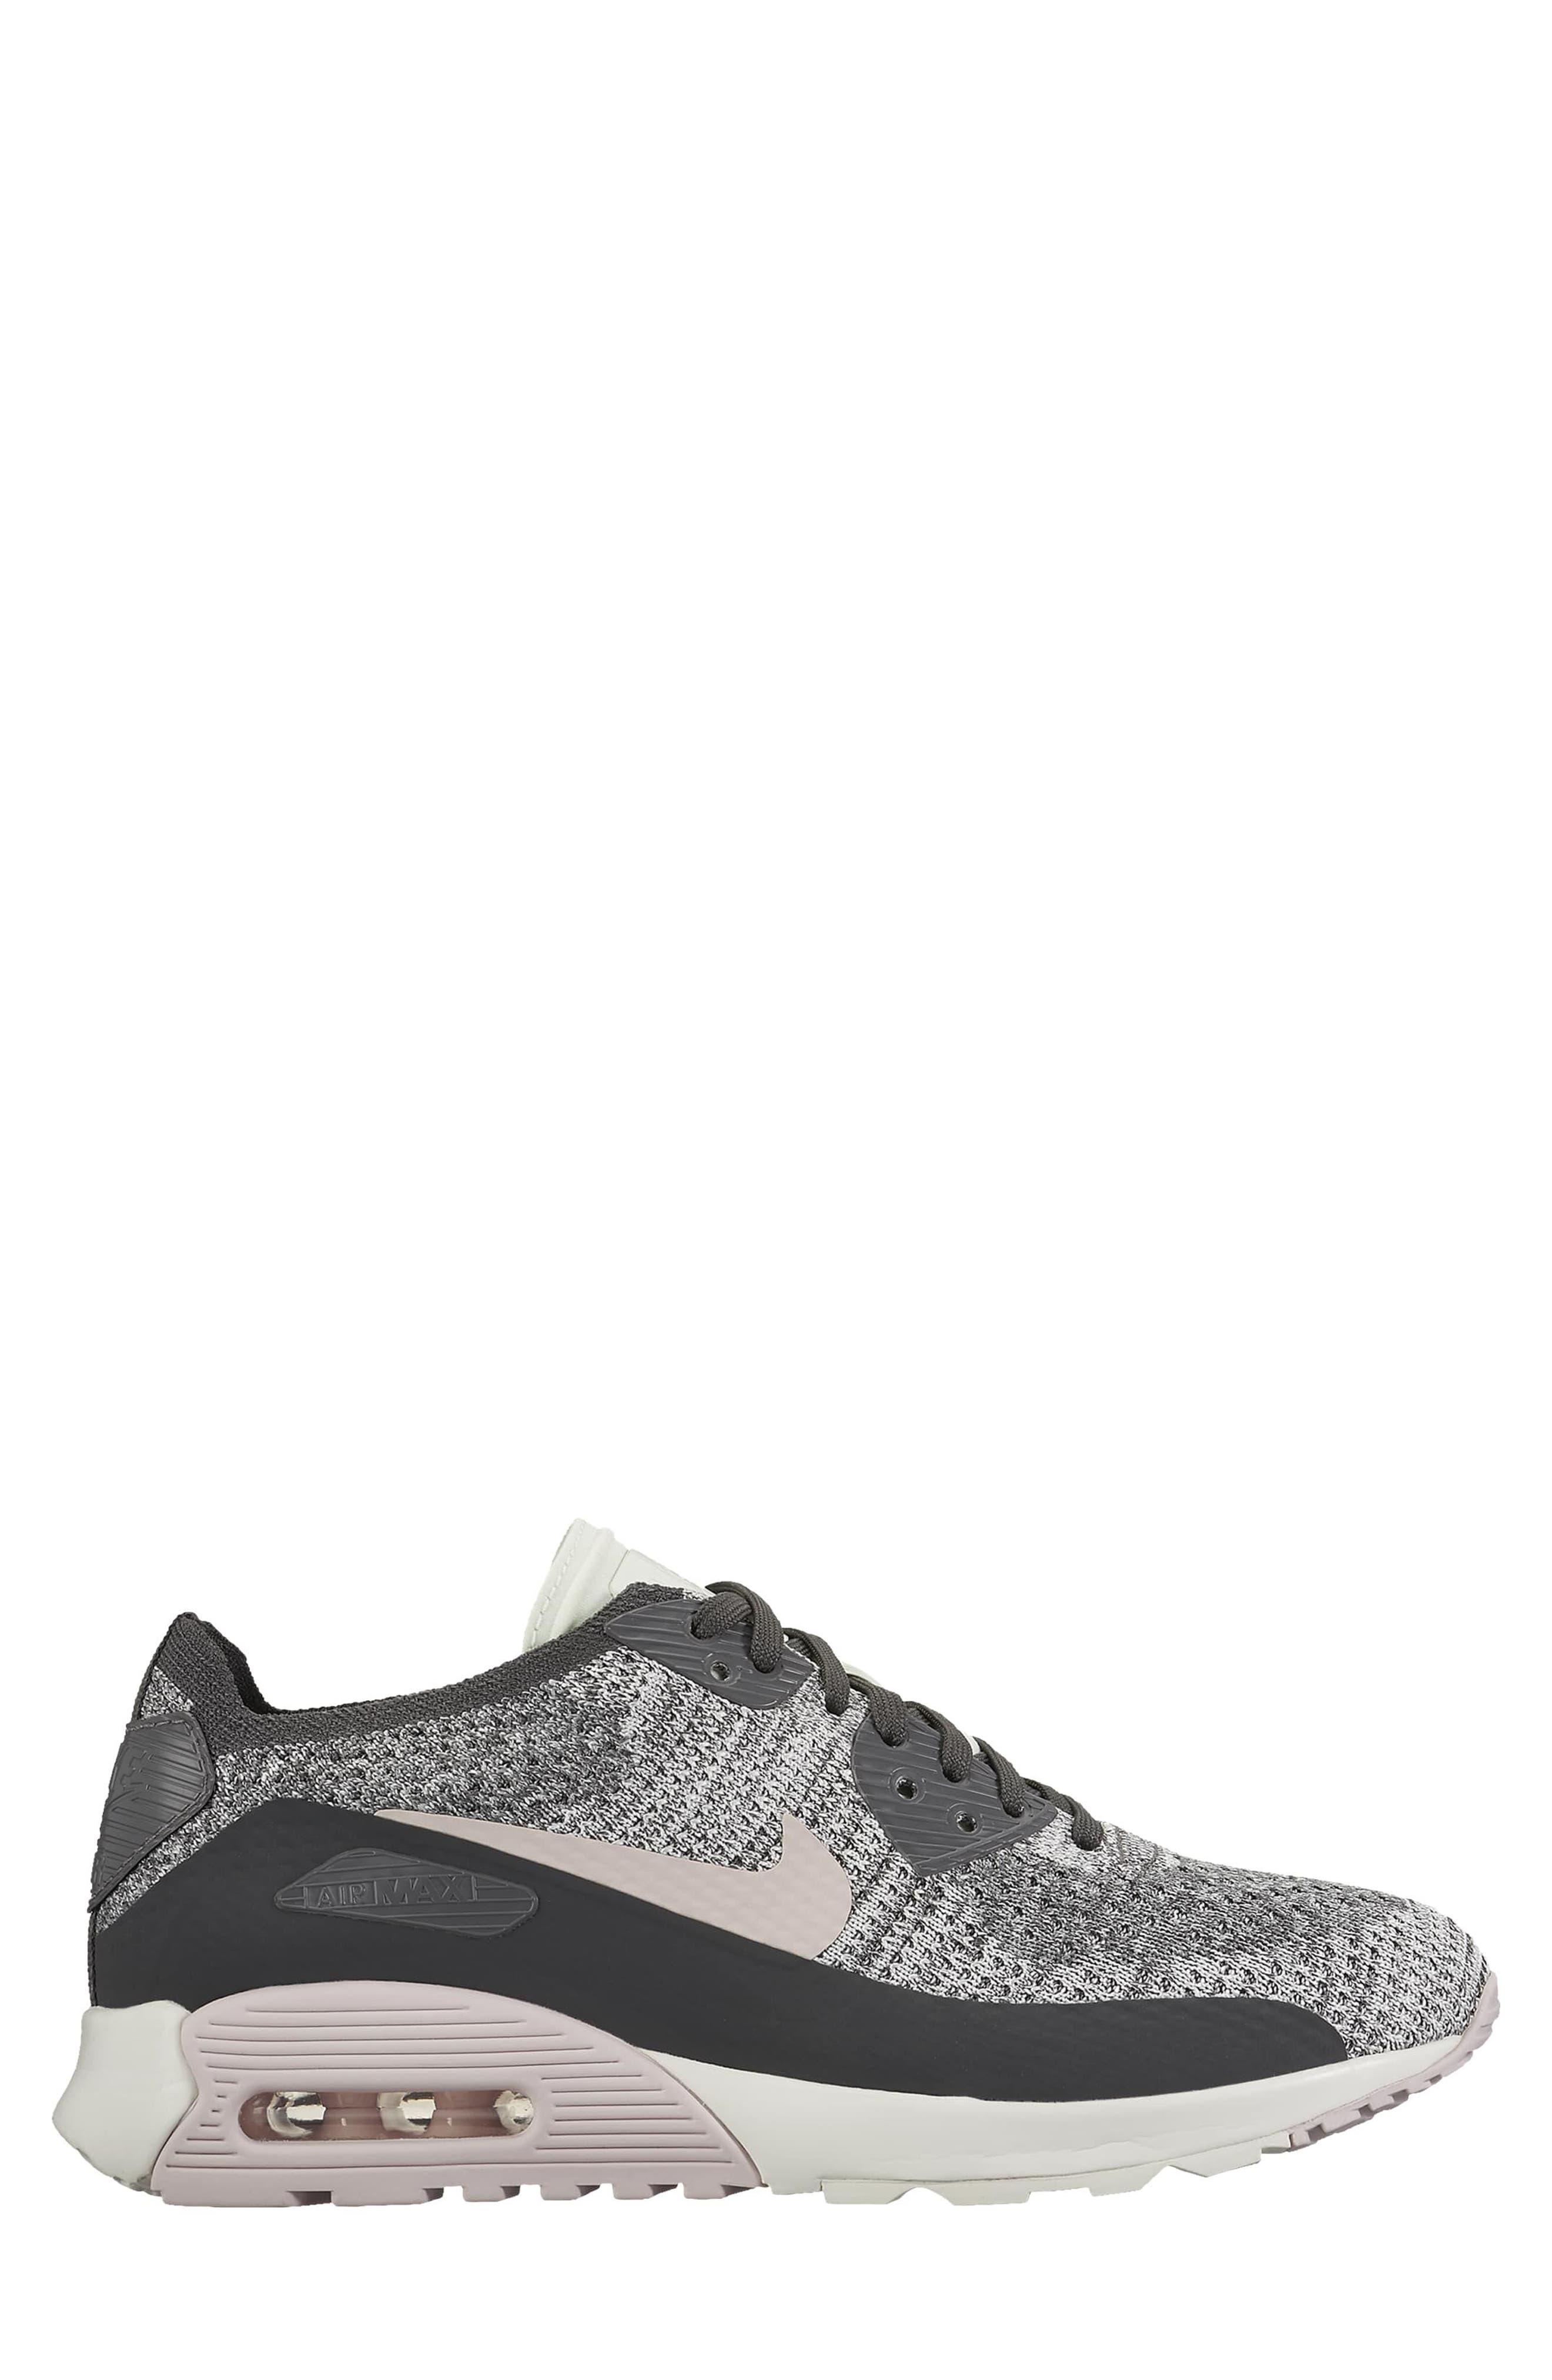 Air Max 90 Flyknit Ultra 2.0 Sneaker,                             Alternate thumbnail 8, color,